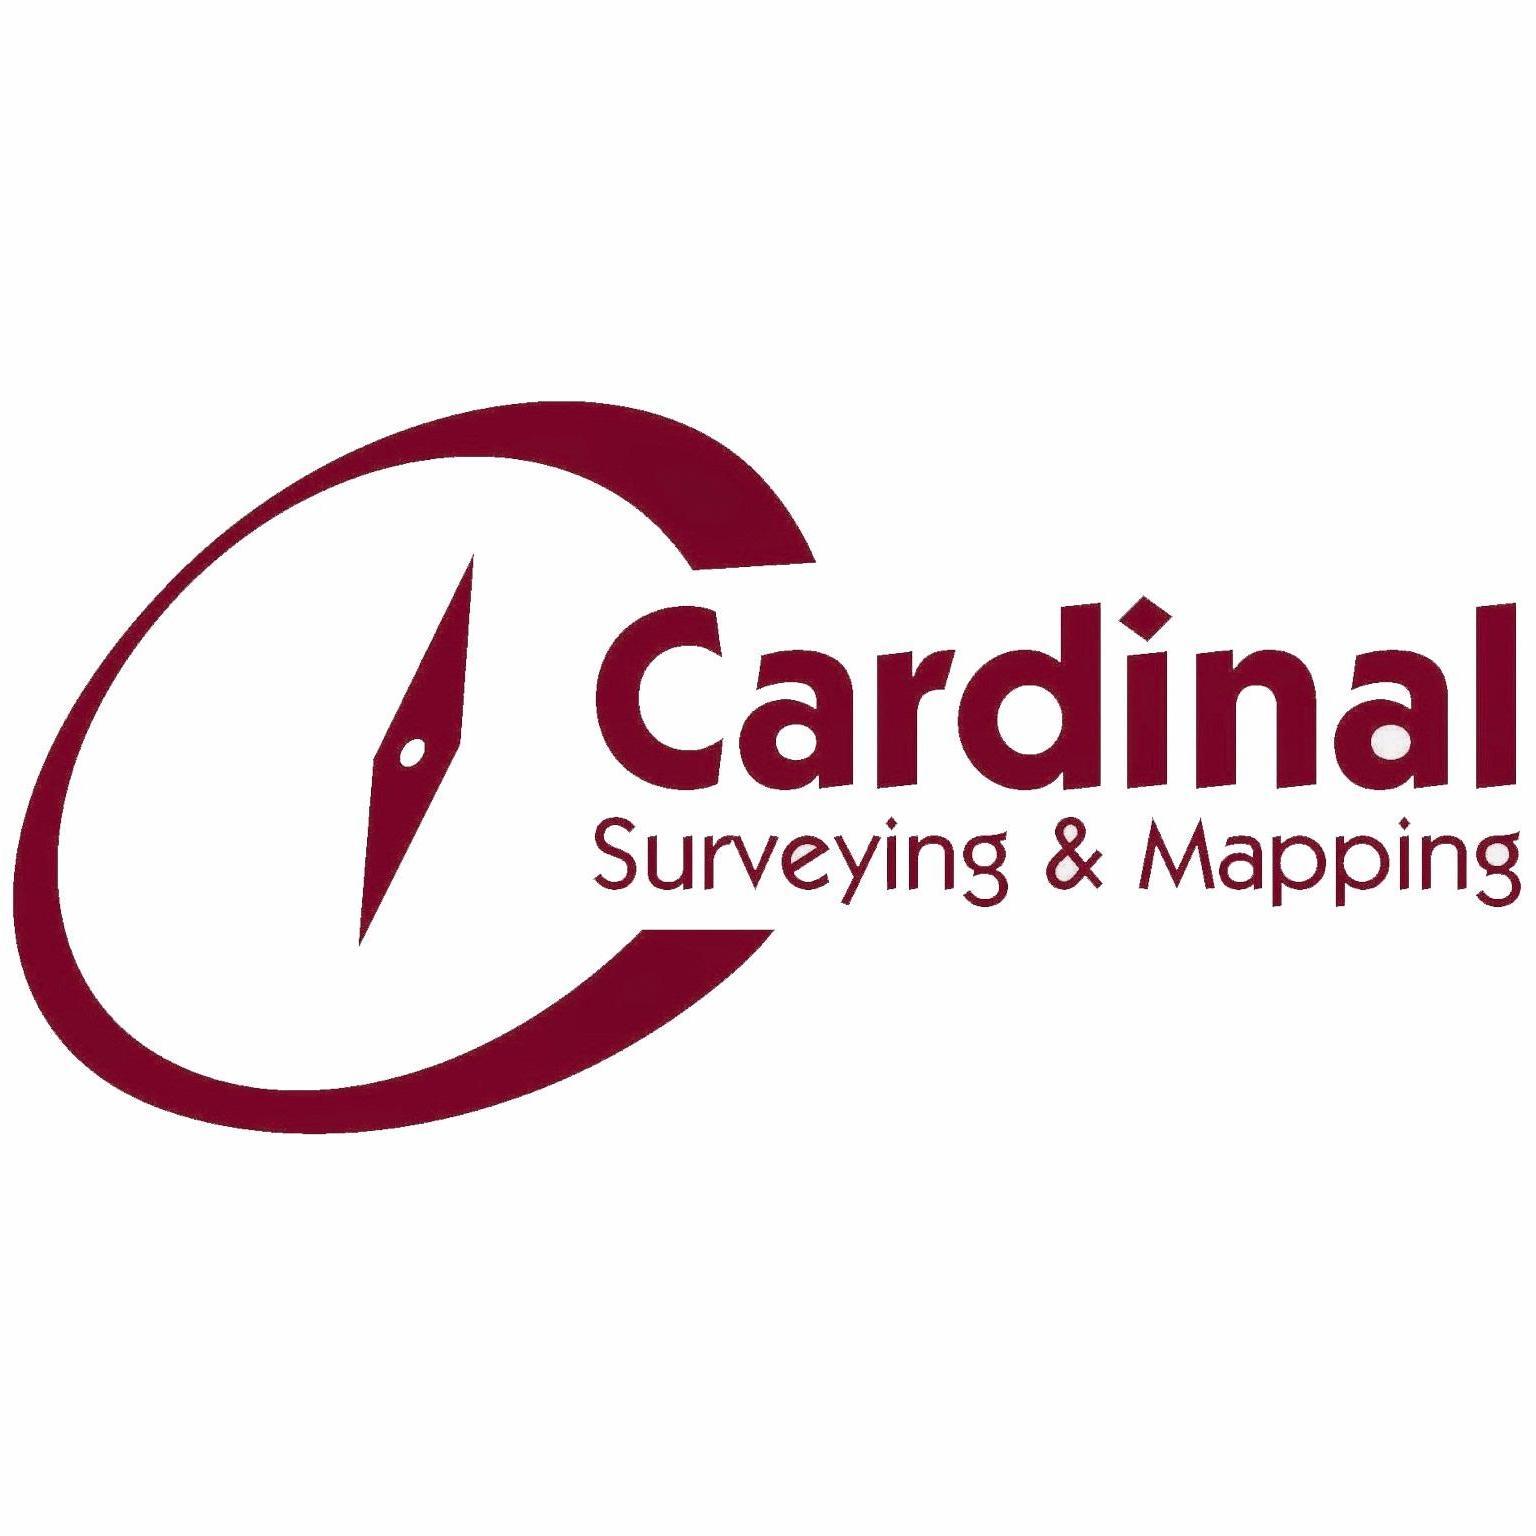 Cardinal Surveying & Mapping